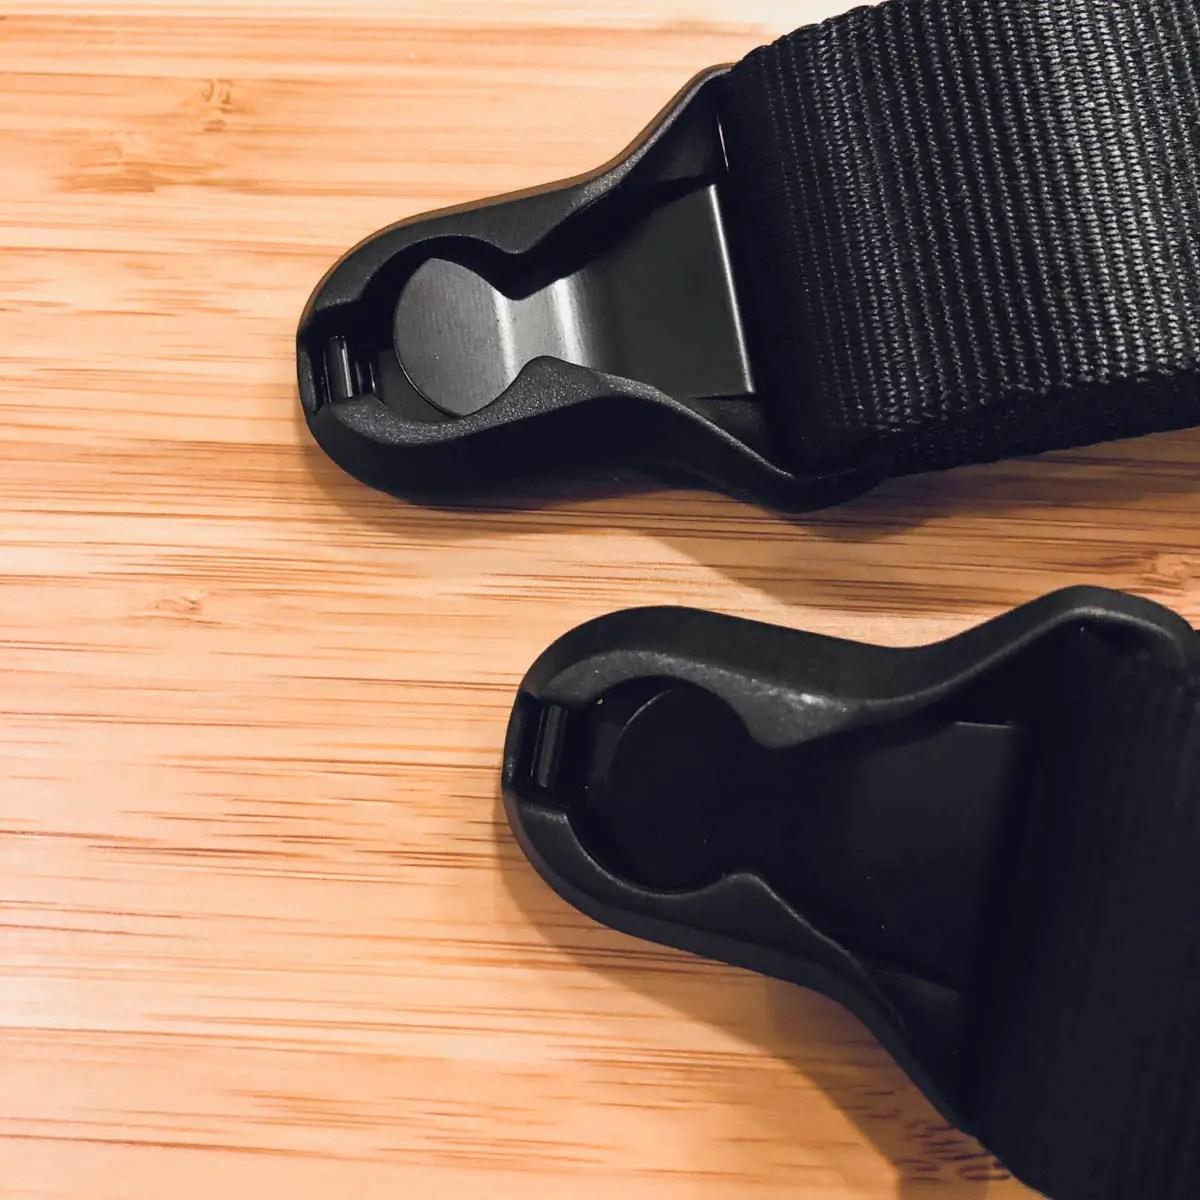 Peak Design - Slide Lite - Anchor mounts